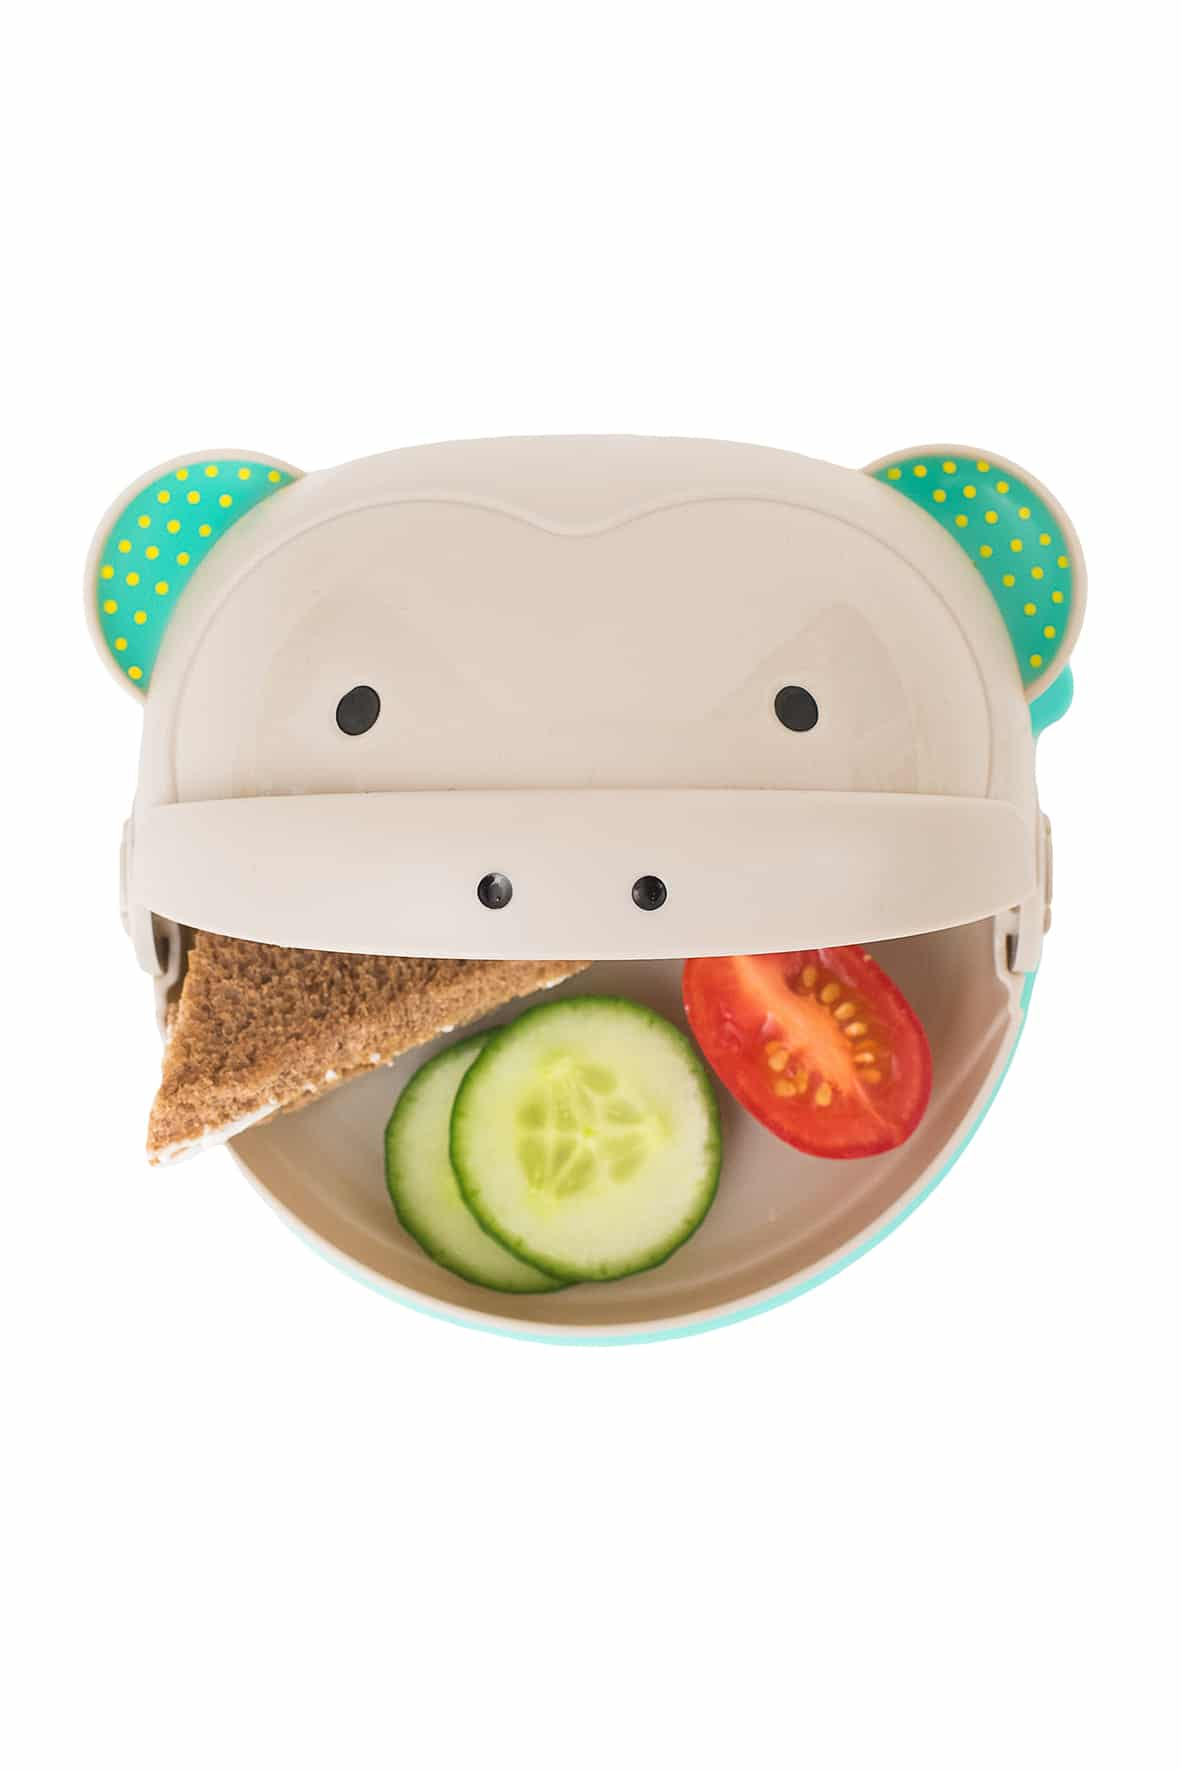 Taf Toys Easier Mealtime Monkey – Hide & Eat